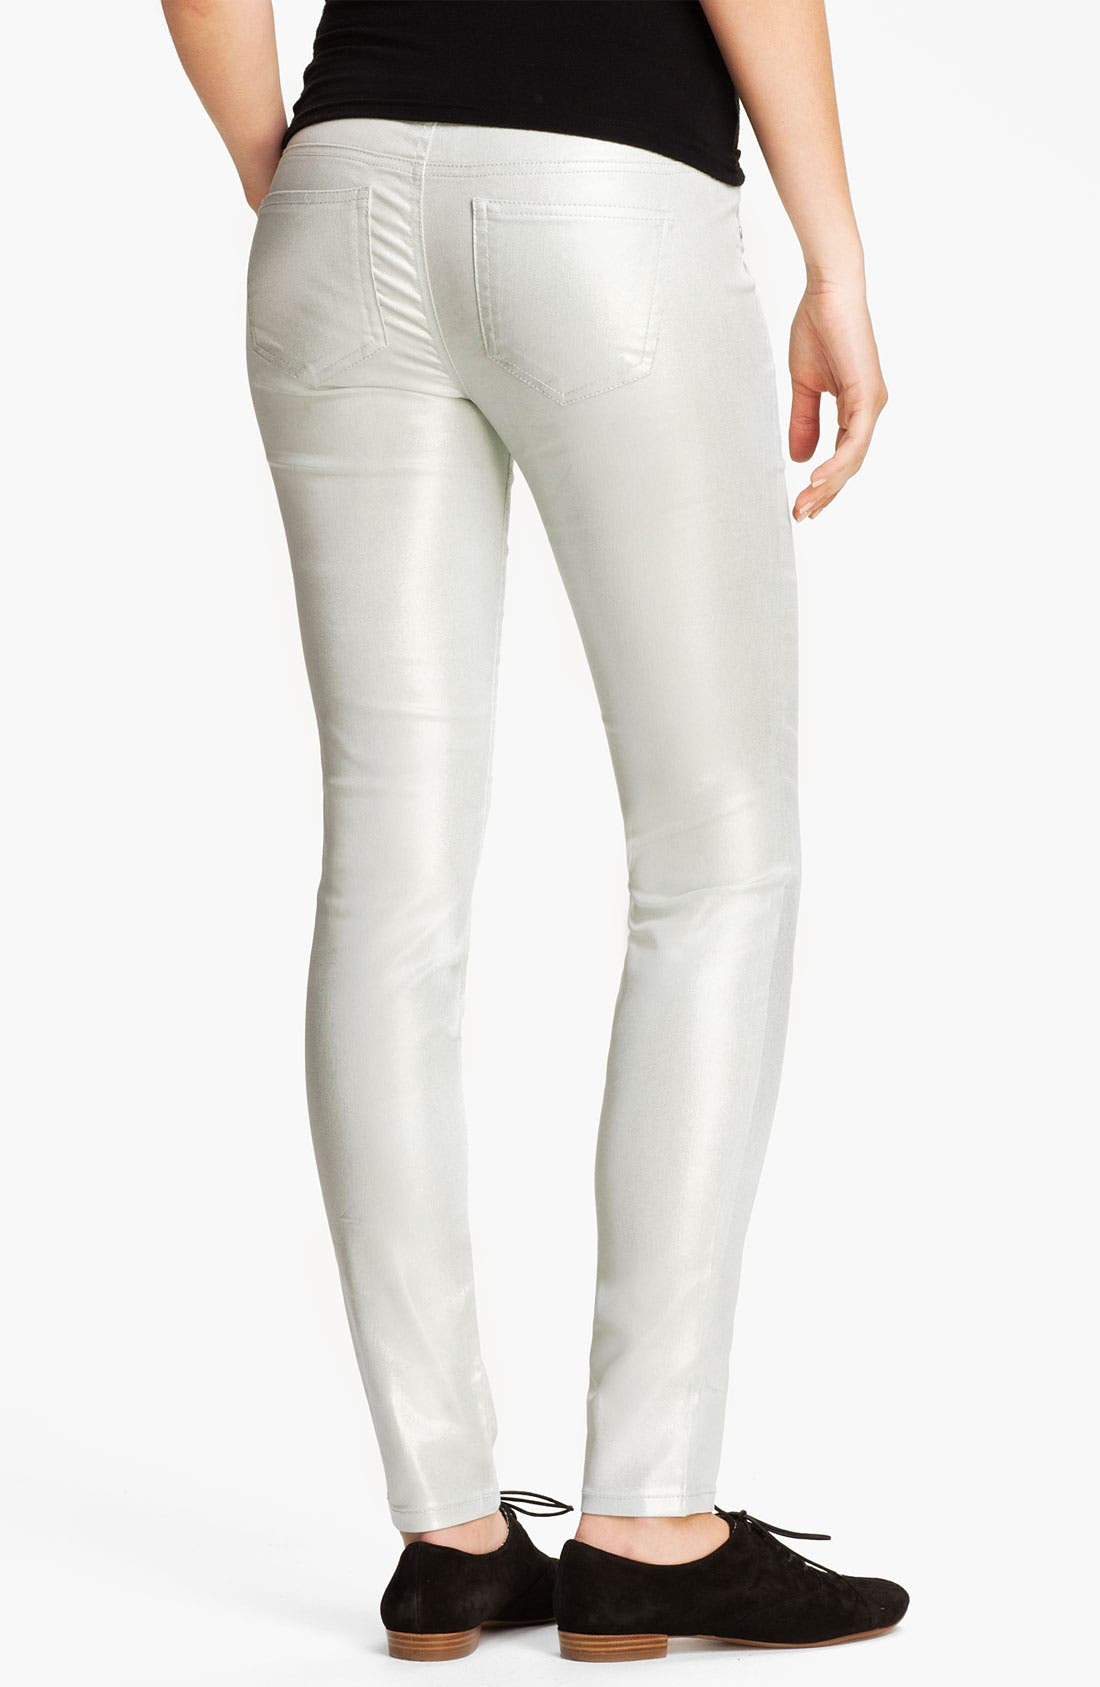 Alternate Image 1 Selected - Fire Pearl Coated Skinny Jeans (Juniors)